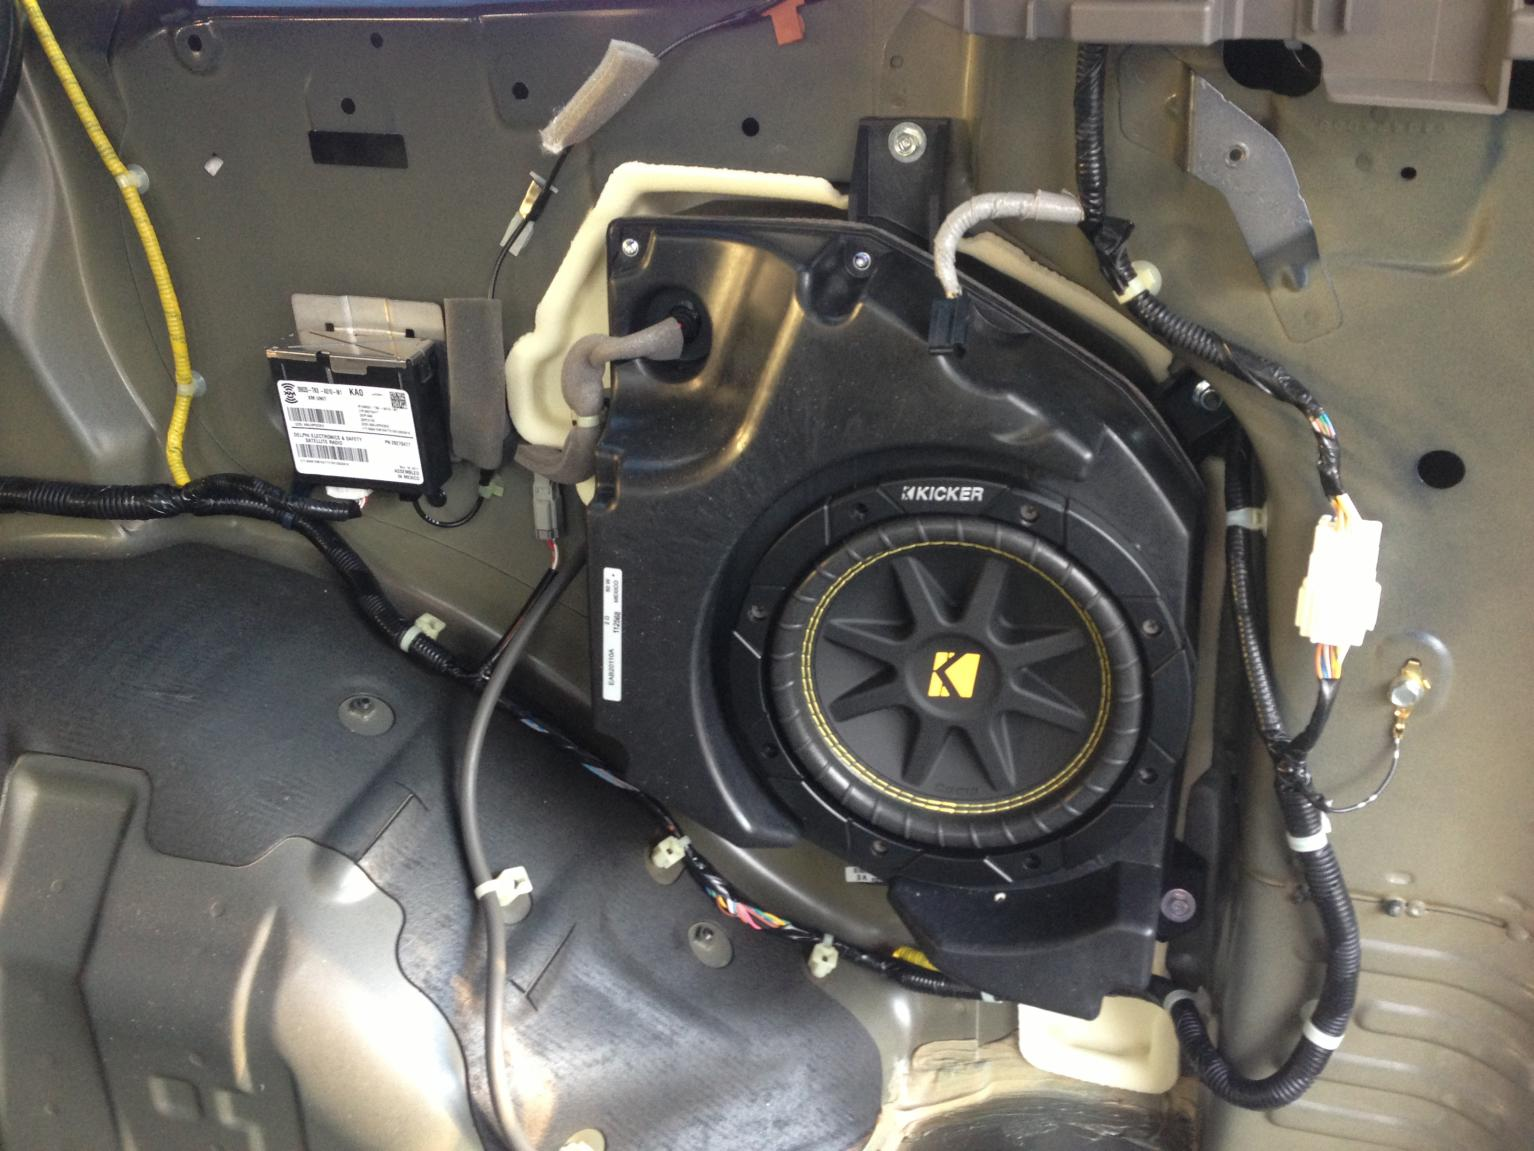 Honda Accord 2005 Rear Speakers How To Remove 9802 Wiring Diagrams 2007 Speaker Diagram Circuit And